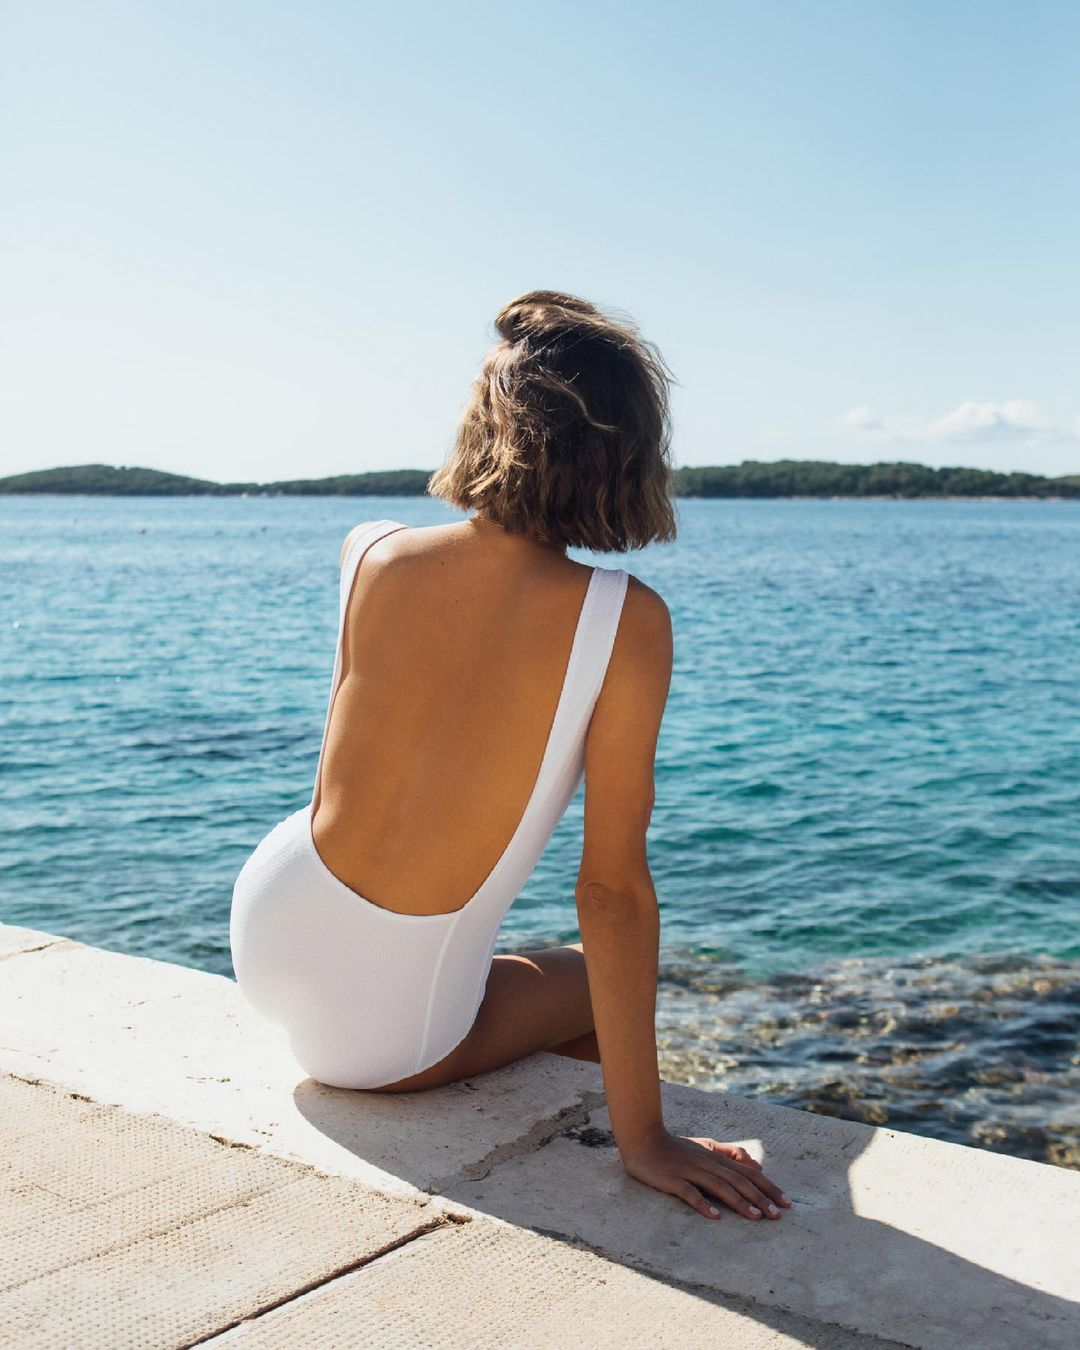 more beachwear, kupaći kostimi, domaći brend, ljeto